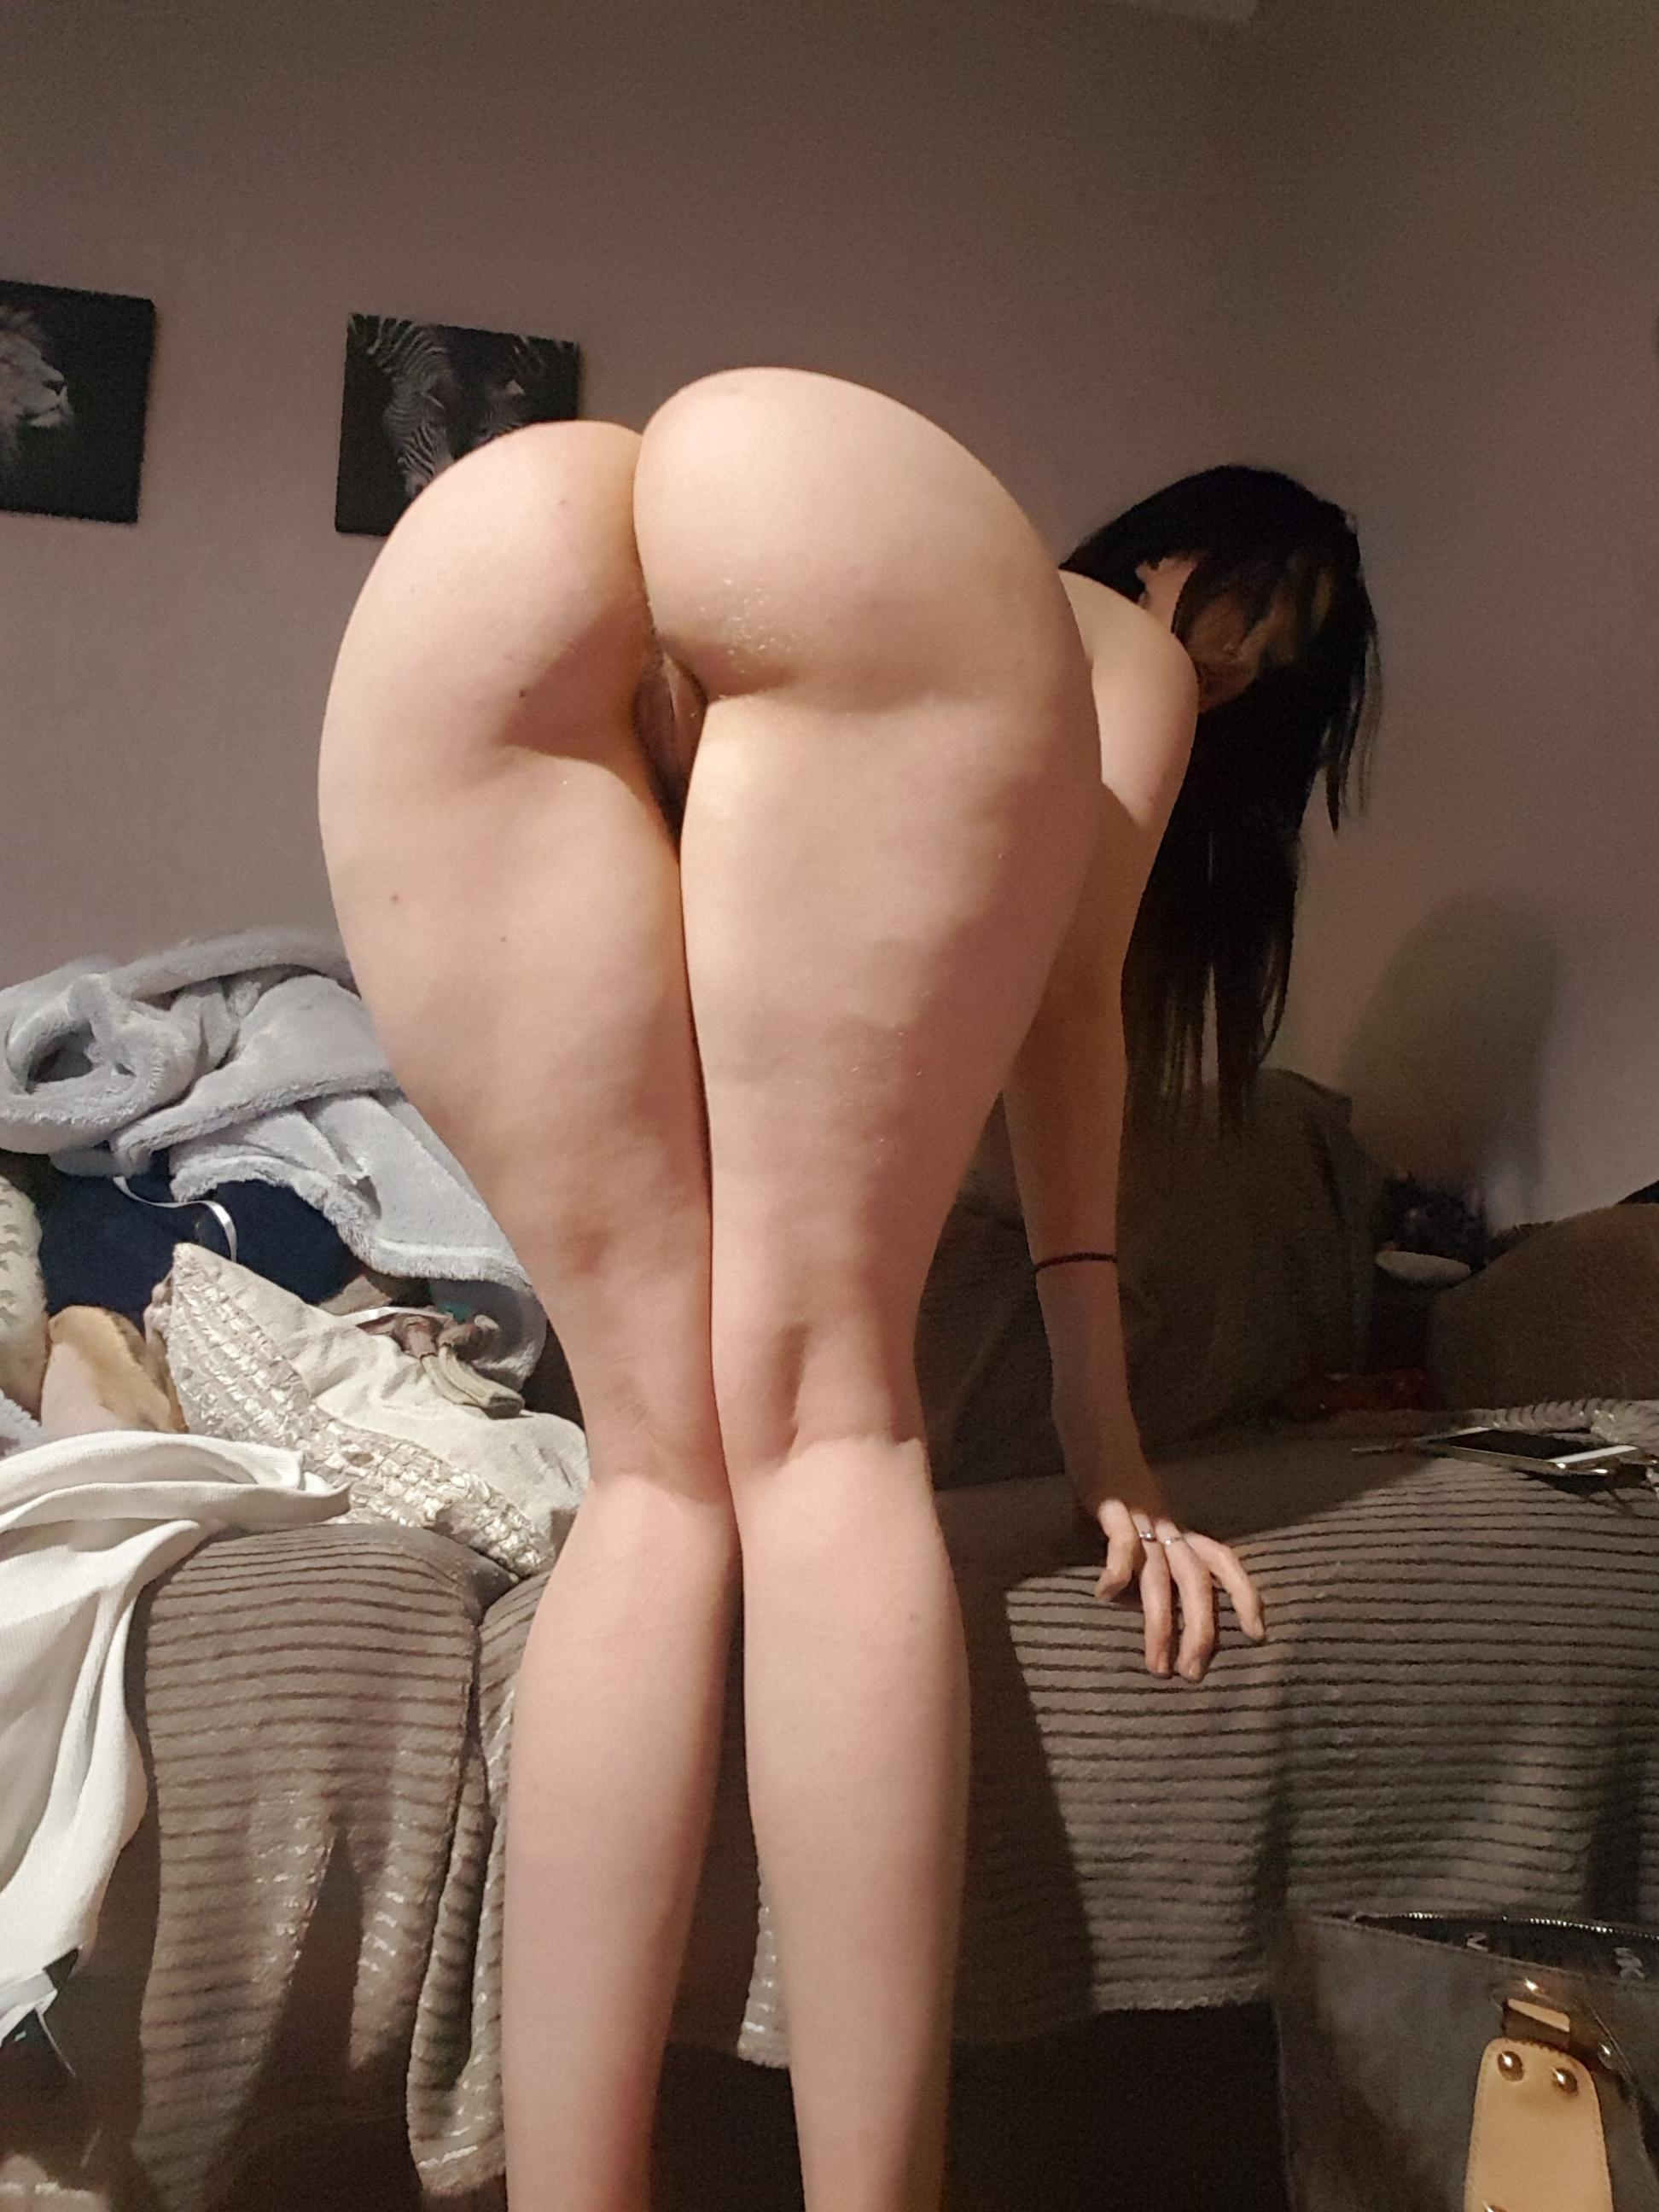 Fat girl shake ass naked on youtube